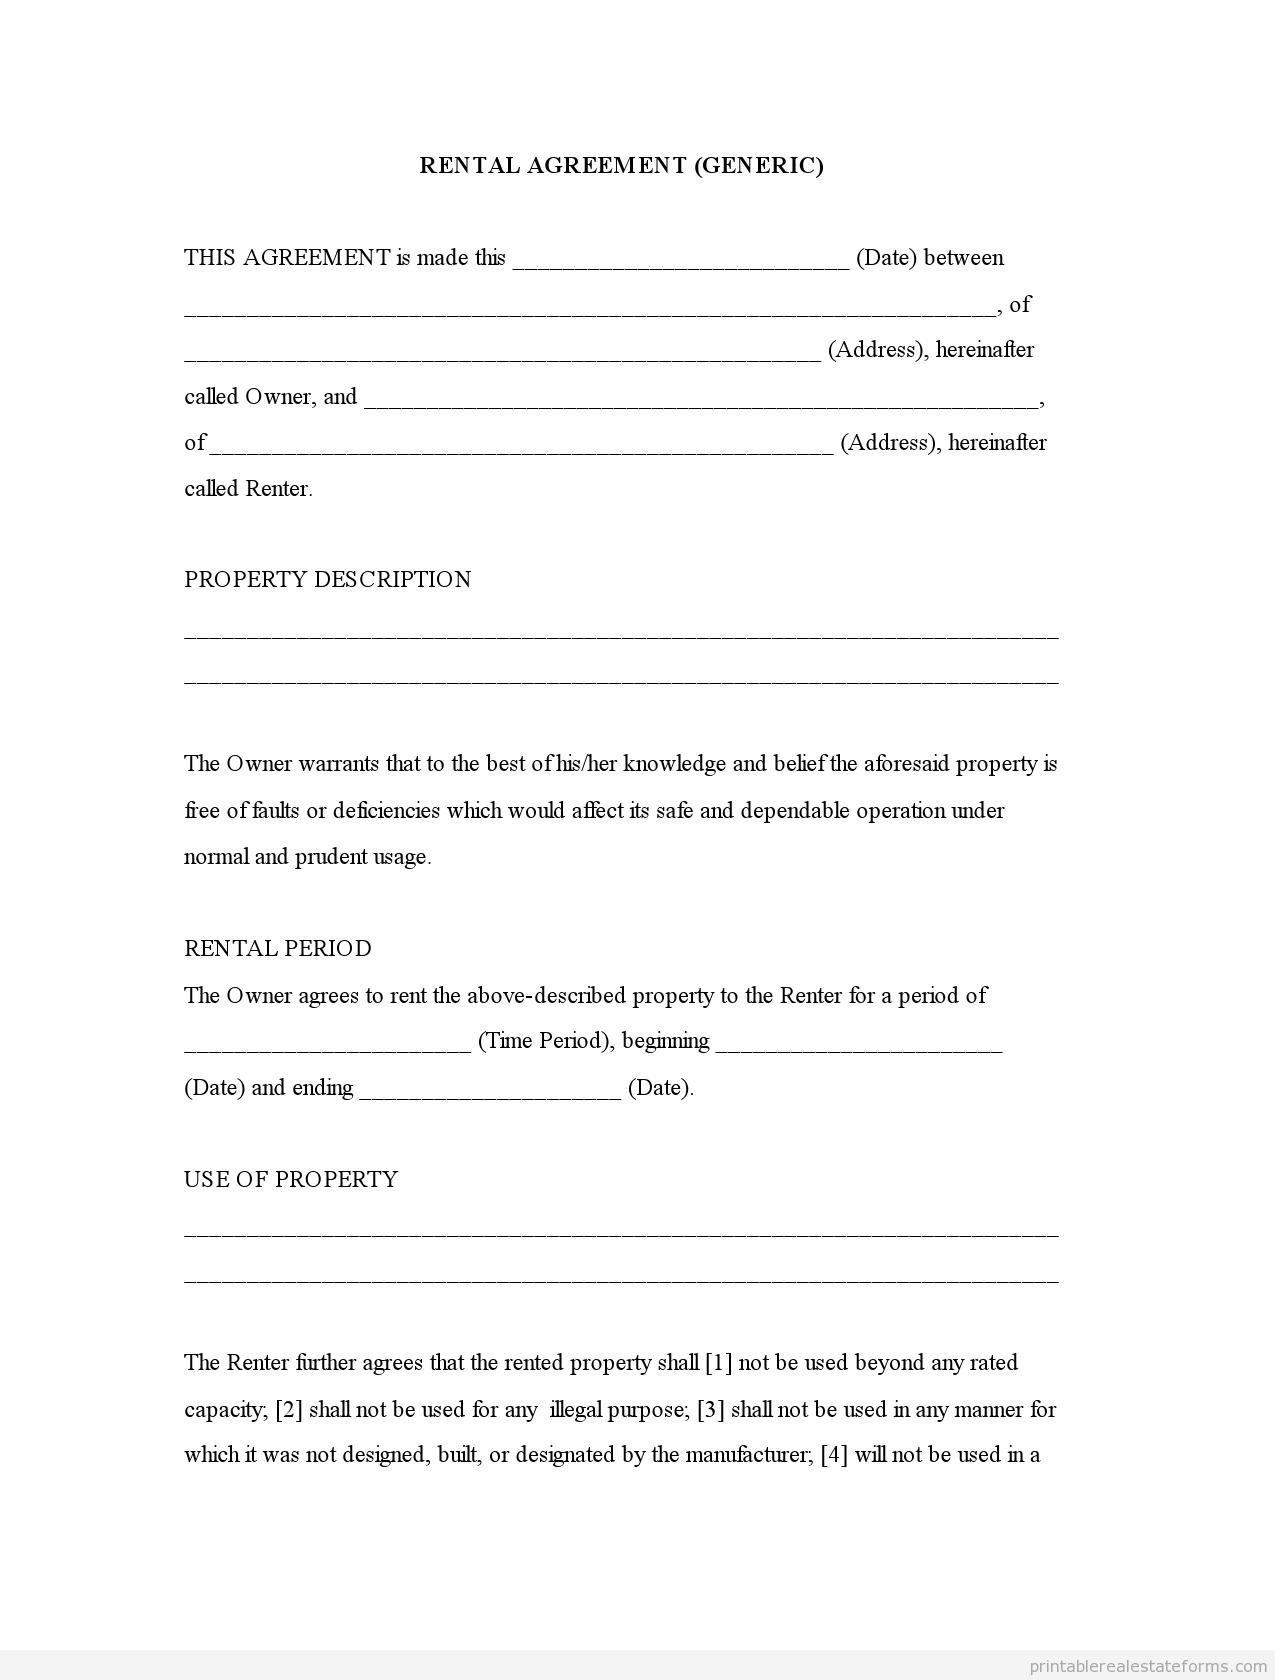 Free Printable Basic Rental Agreement | gtld world congress